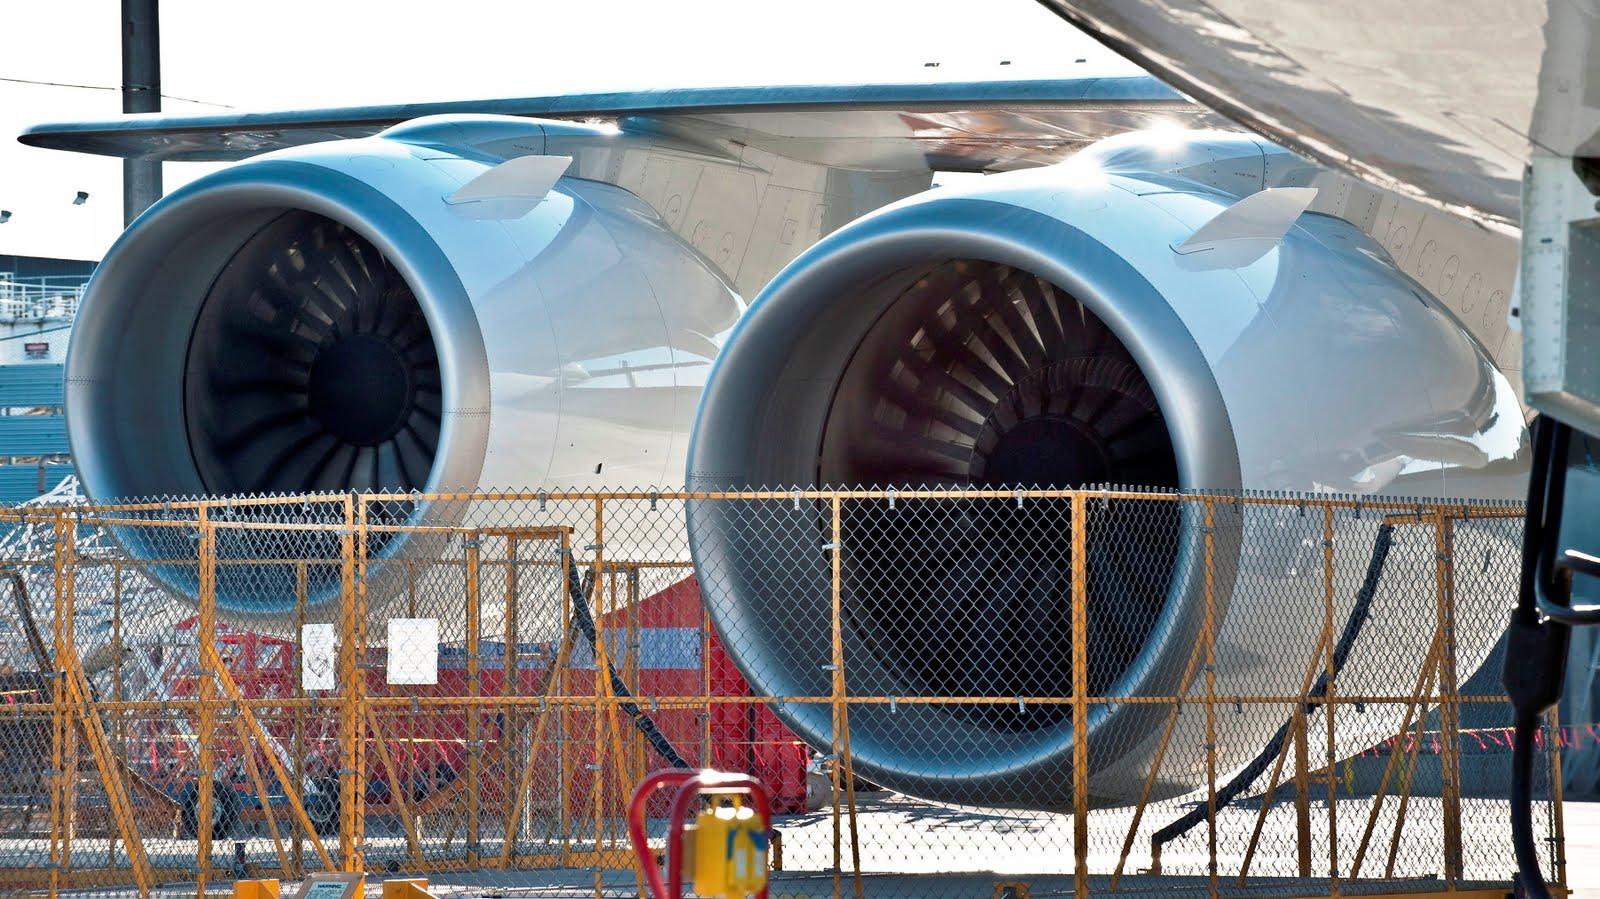 http://1.bp.blogspot.com/-q0Zuzs-yxnA/TjsnLUd3y8I/AAAAAAAAGLE/X-p-QIayCus/s1600/boeing_747_8_engine_running_test_124124_aircraft-wallpaper.jpg